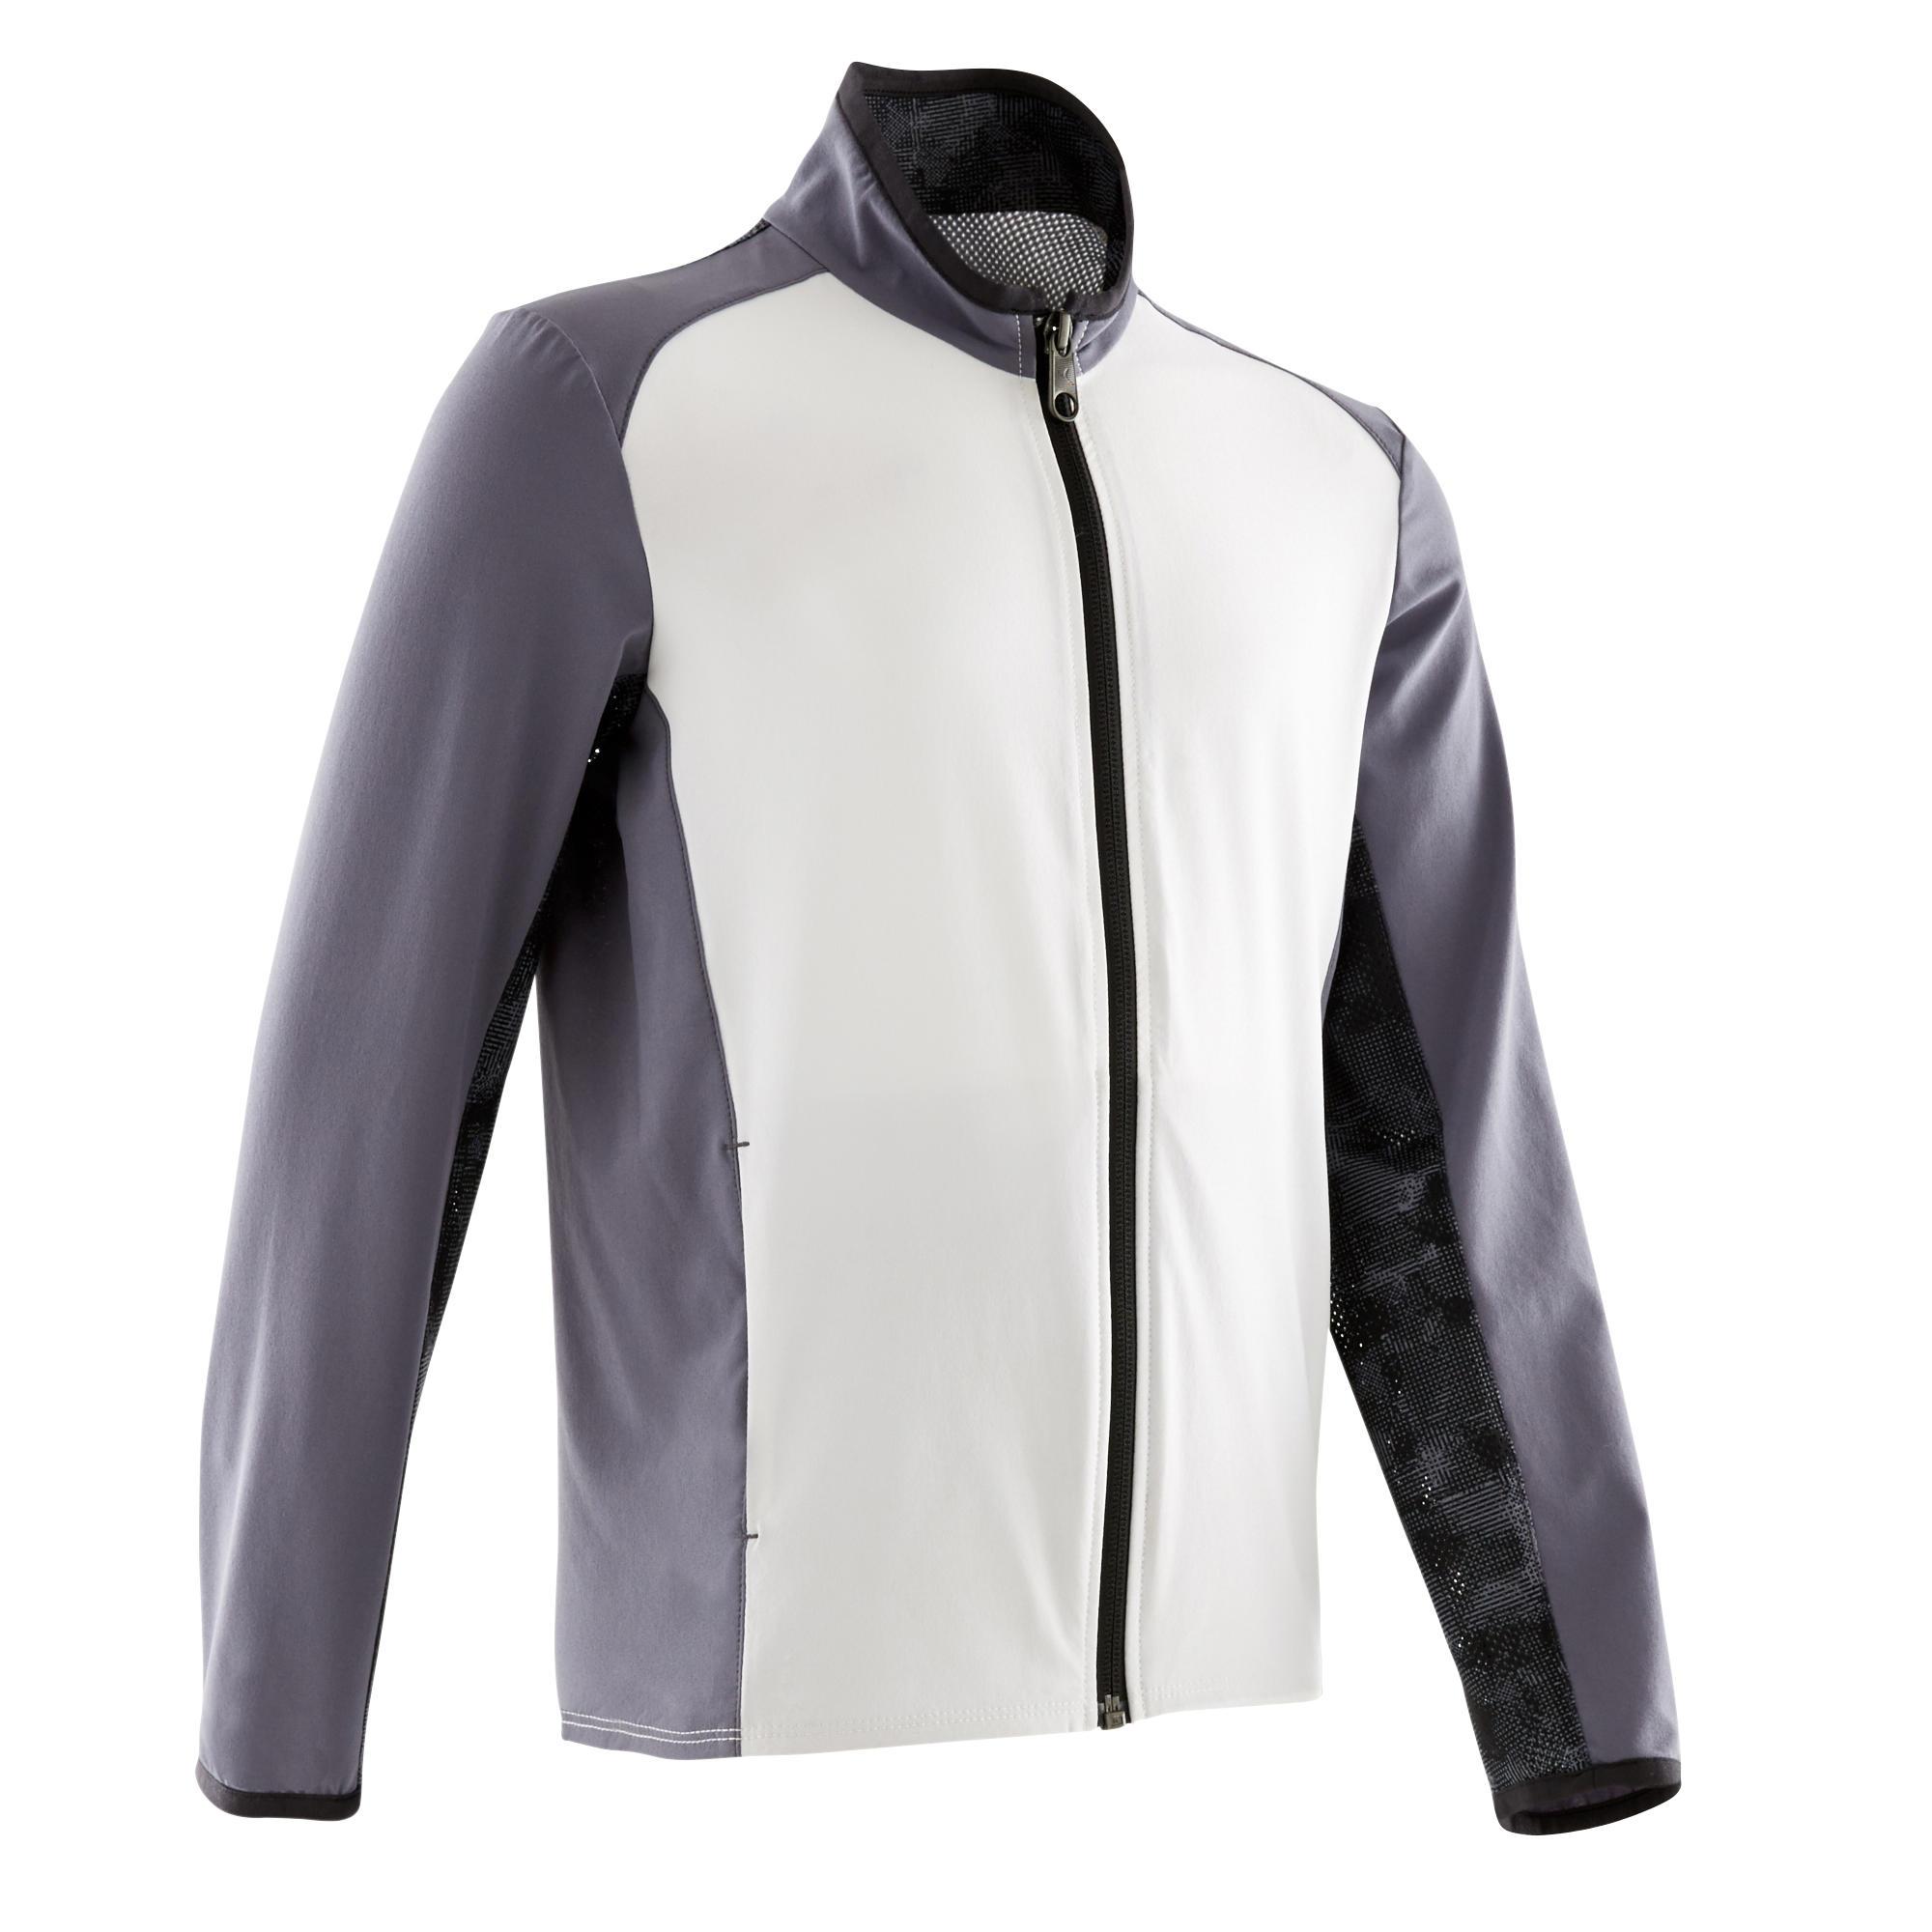 Jachetă W500 alb gri băieți